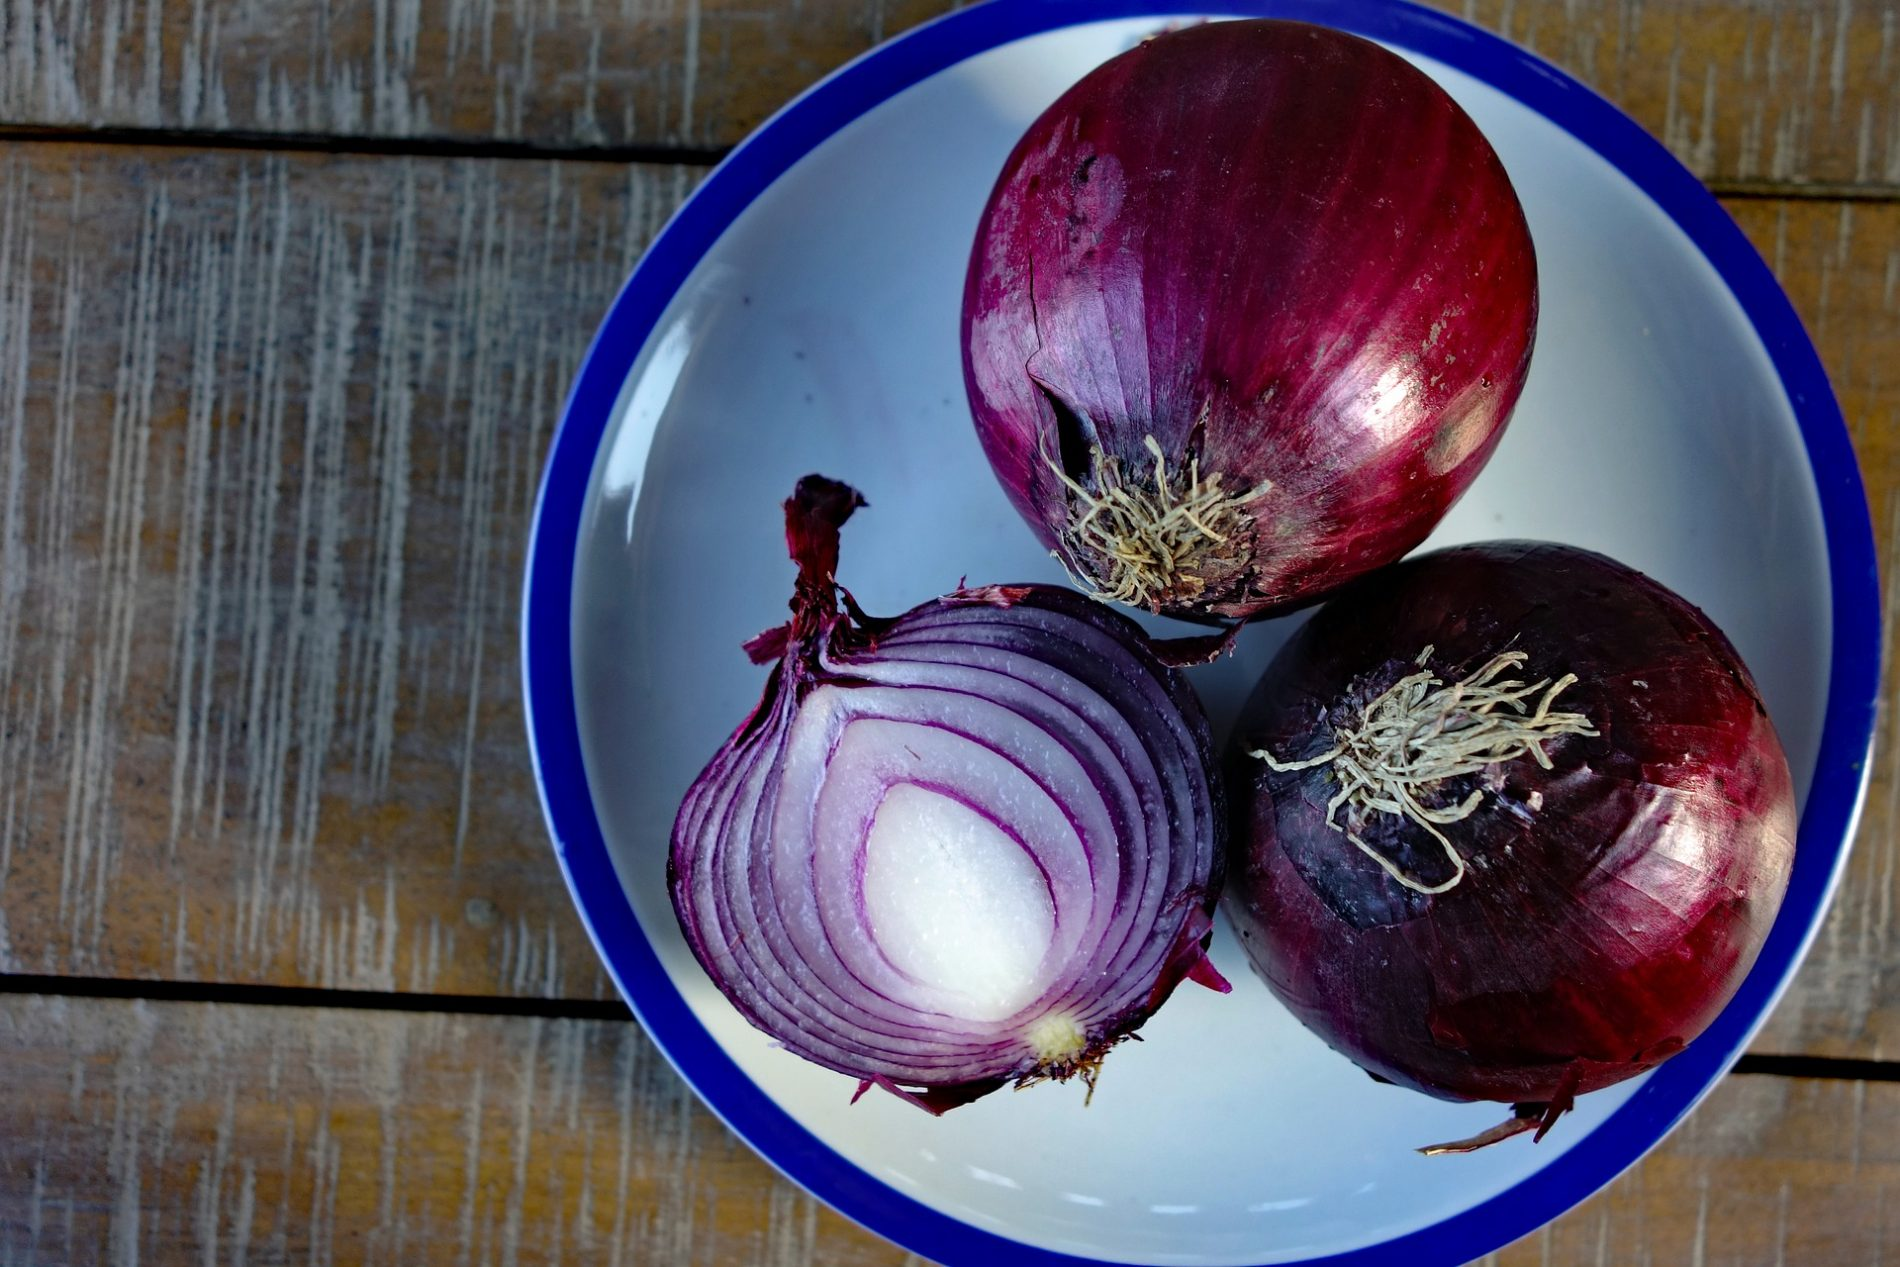 Saint-Trojan-Les-Bains / Saint Turjan onion